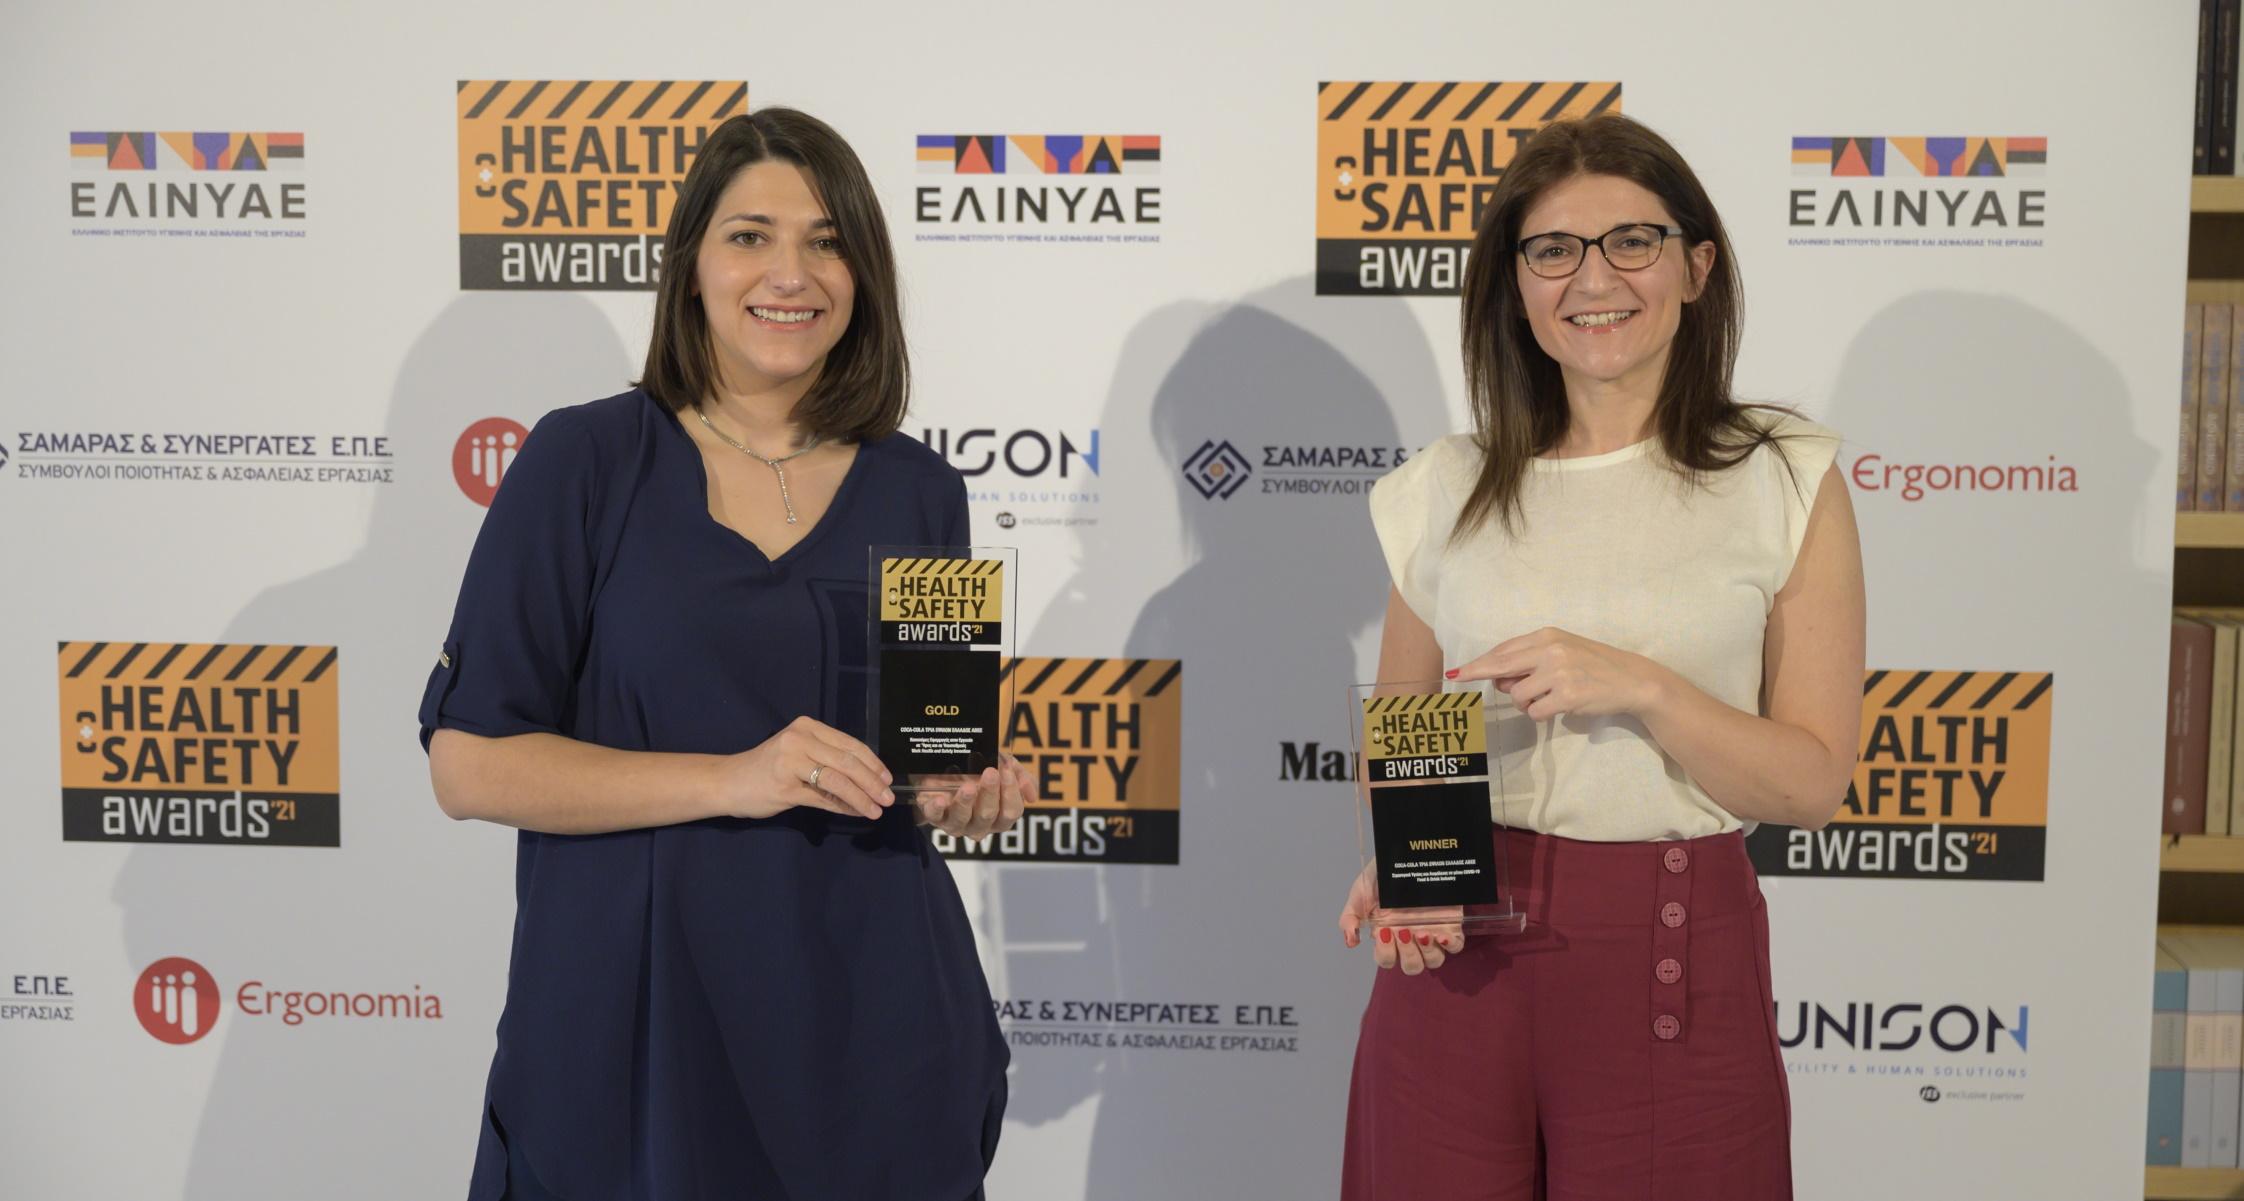 Coca Cola 3Ε: Δύο βραβεία στον τομέα Υγείας και Ασφάλειας